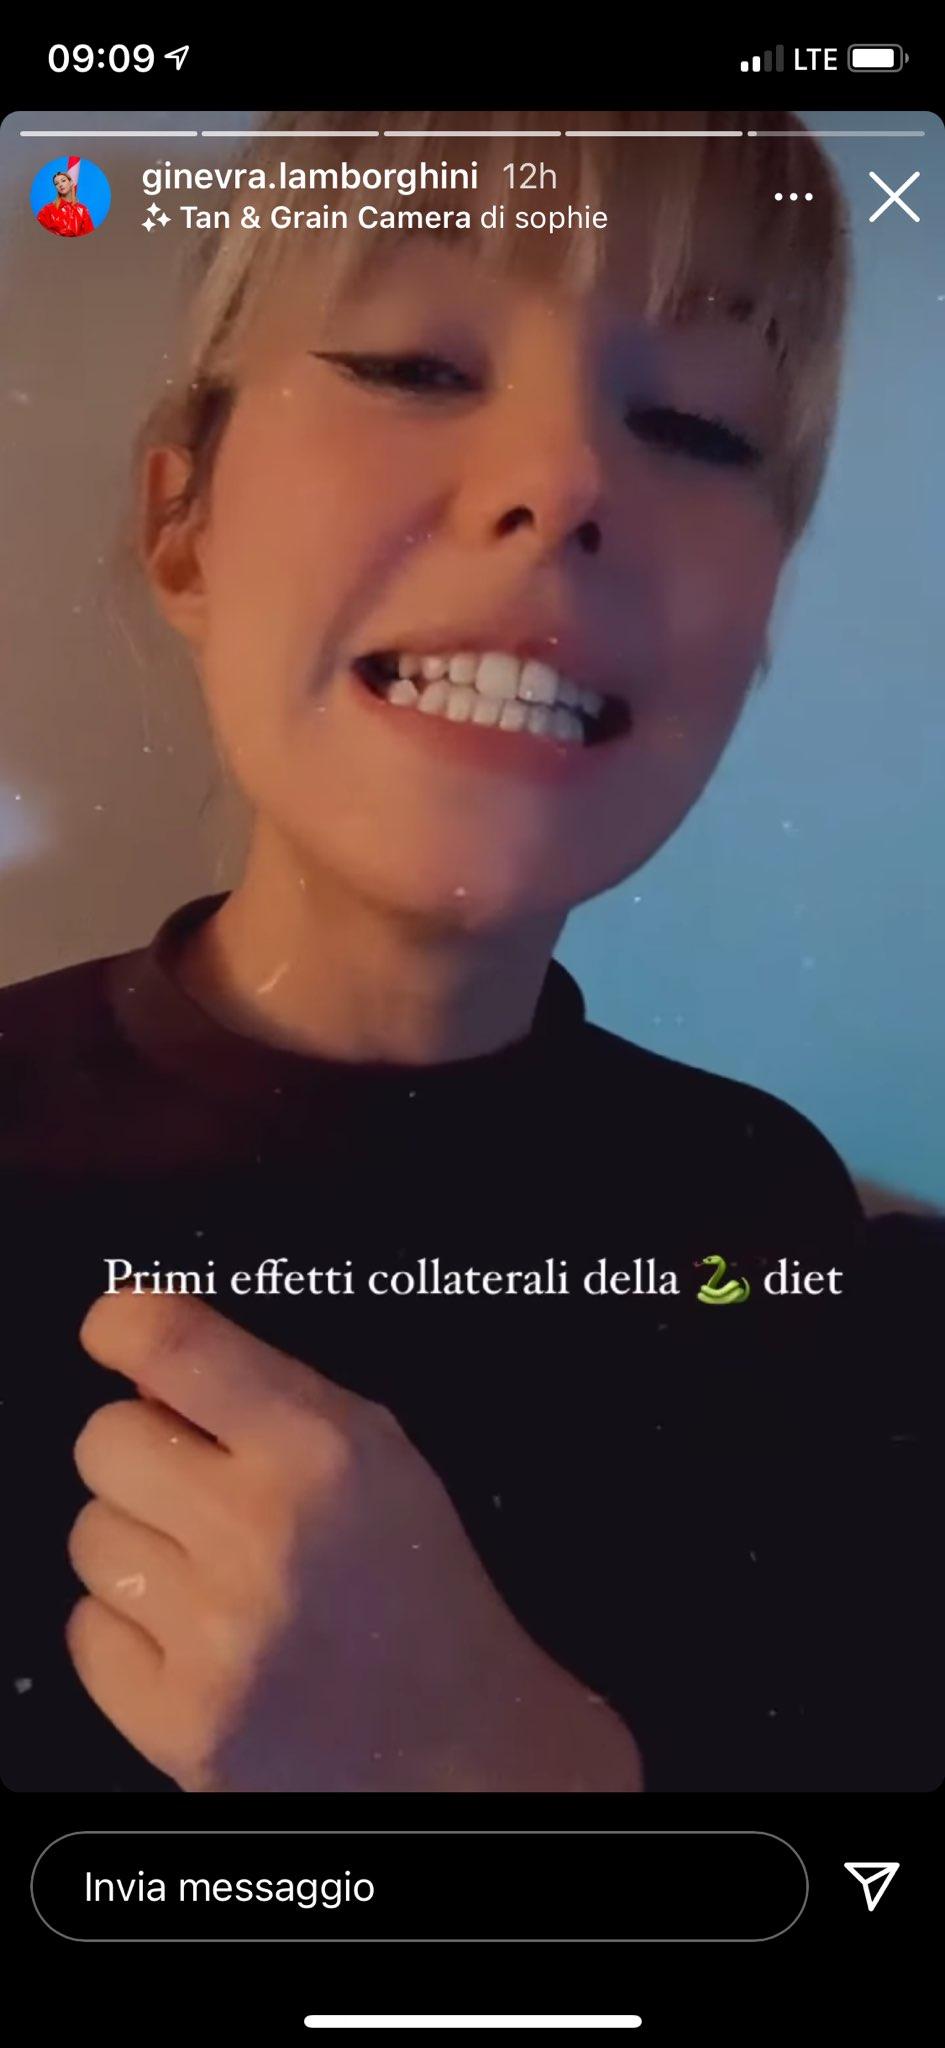 Ginevra Lamborghini dieta